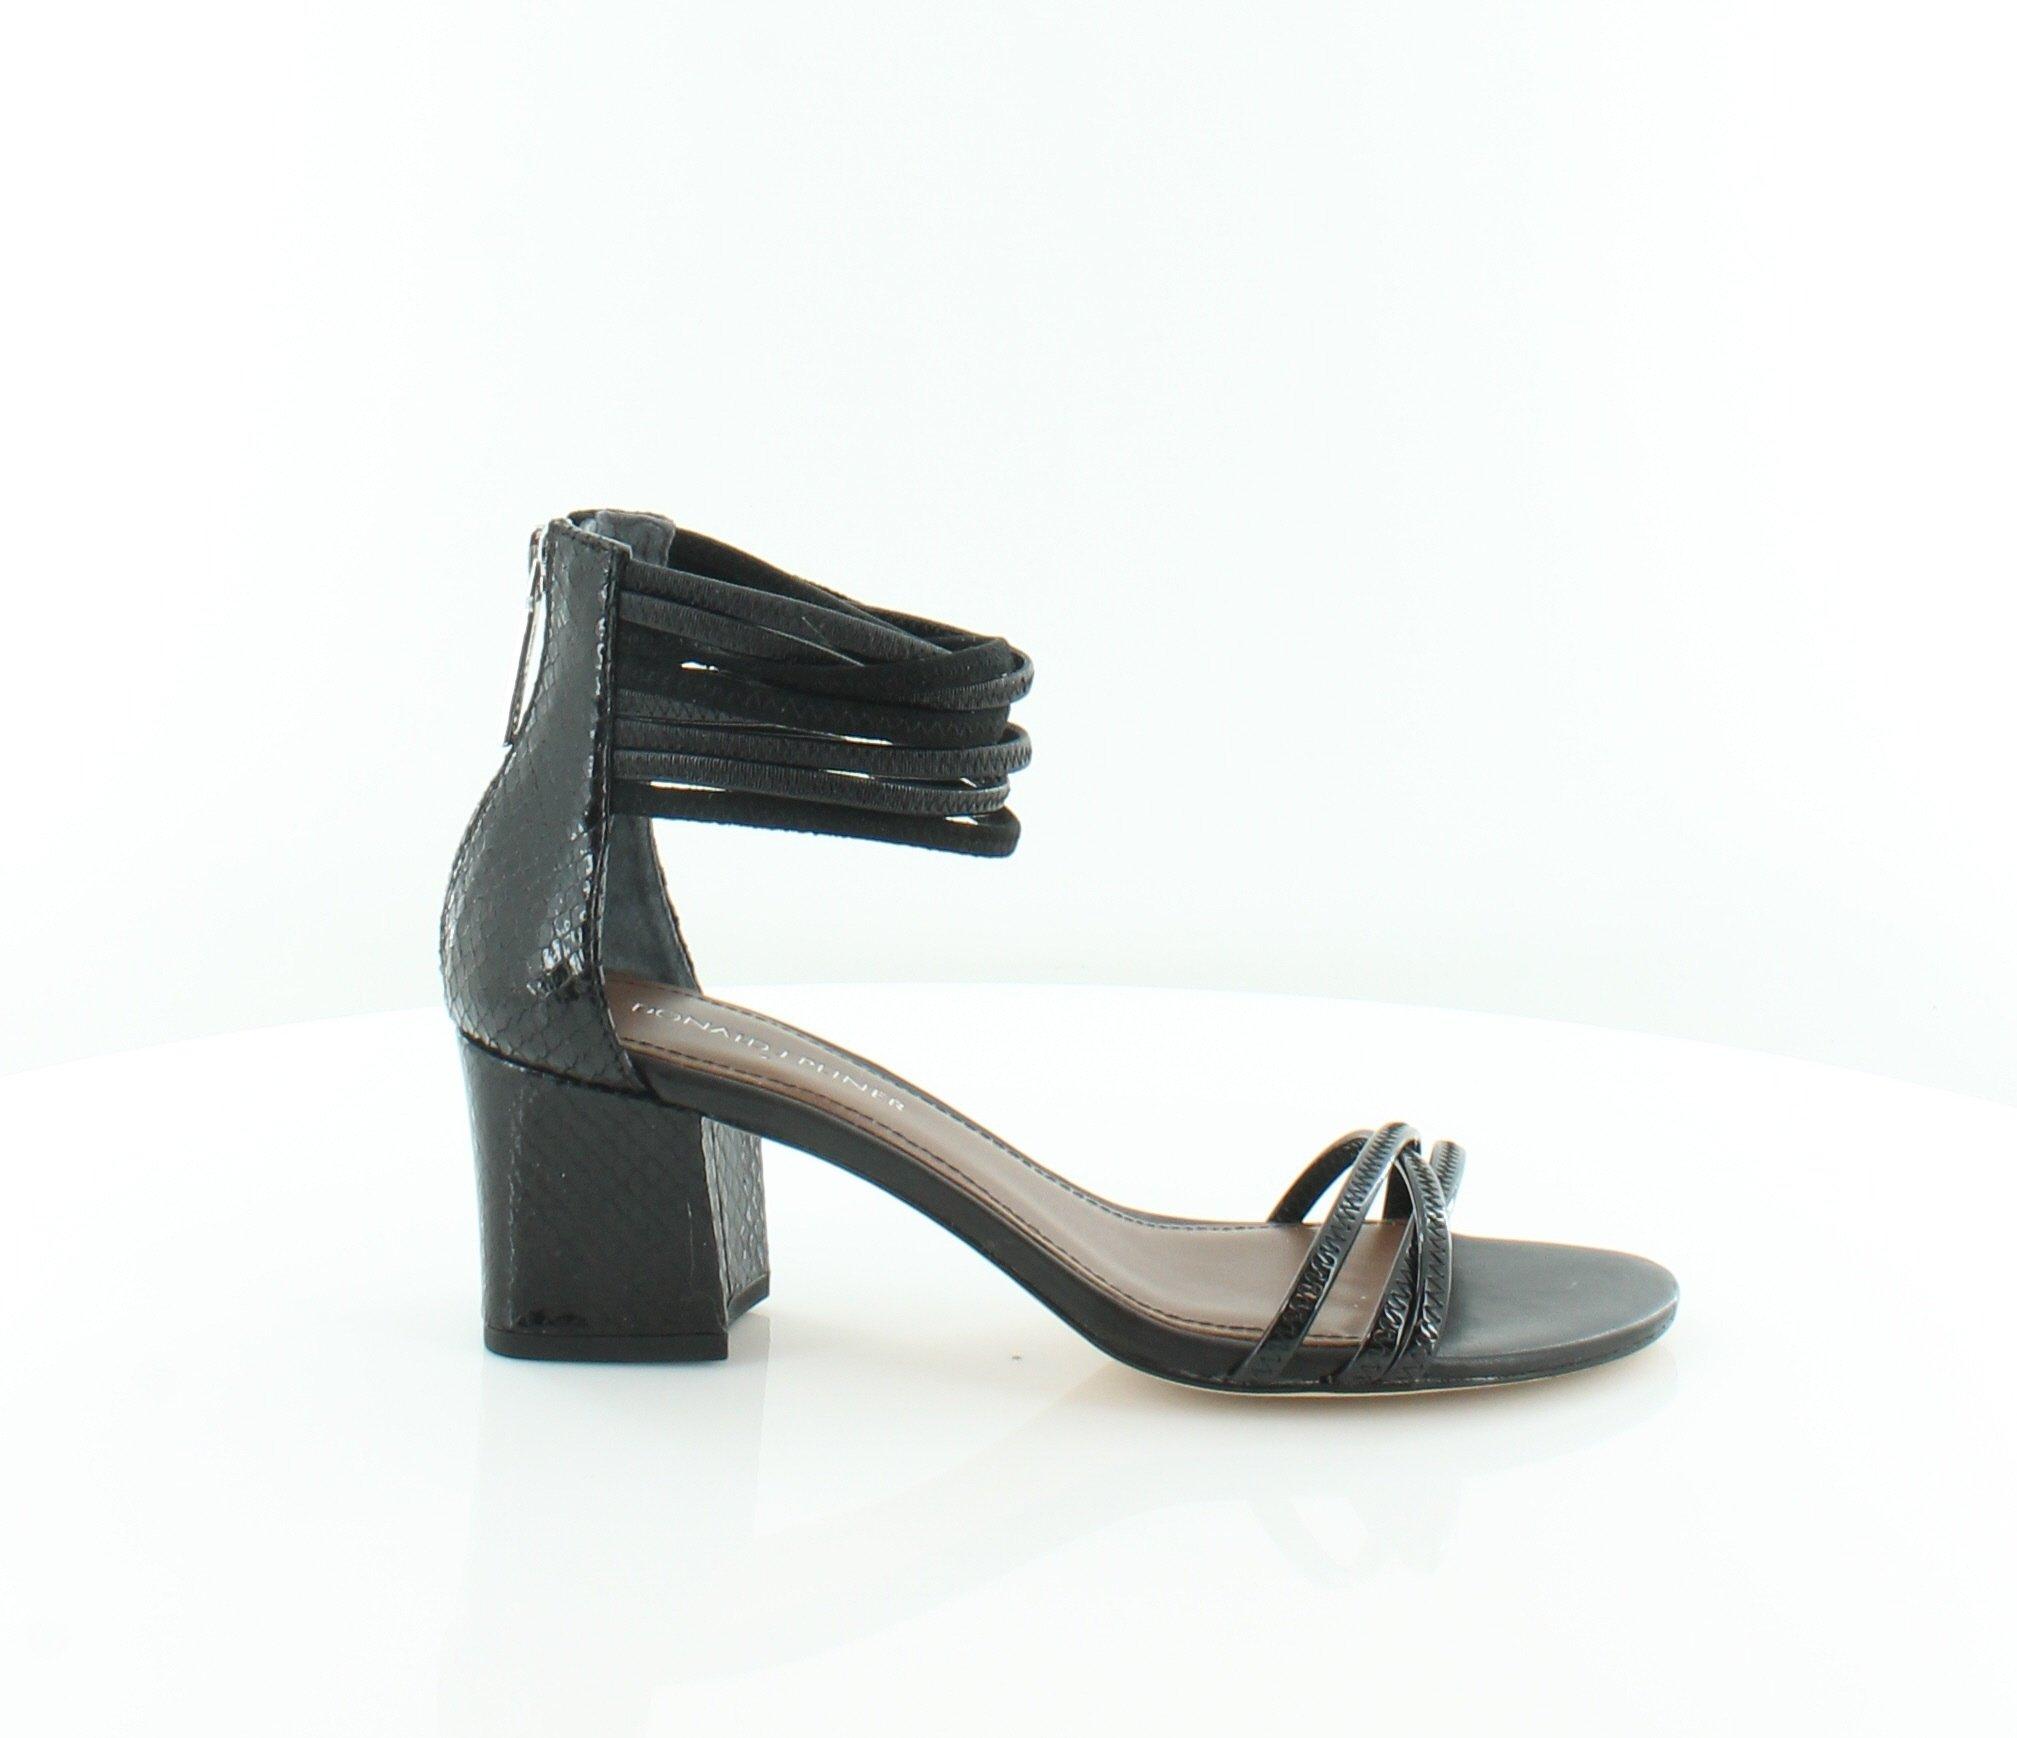 Donald J Pliner Women's Essie Dress Heeled Sandal Black/Black Size 8 M US